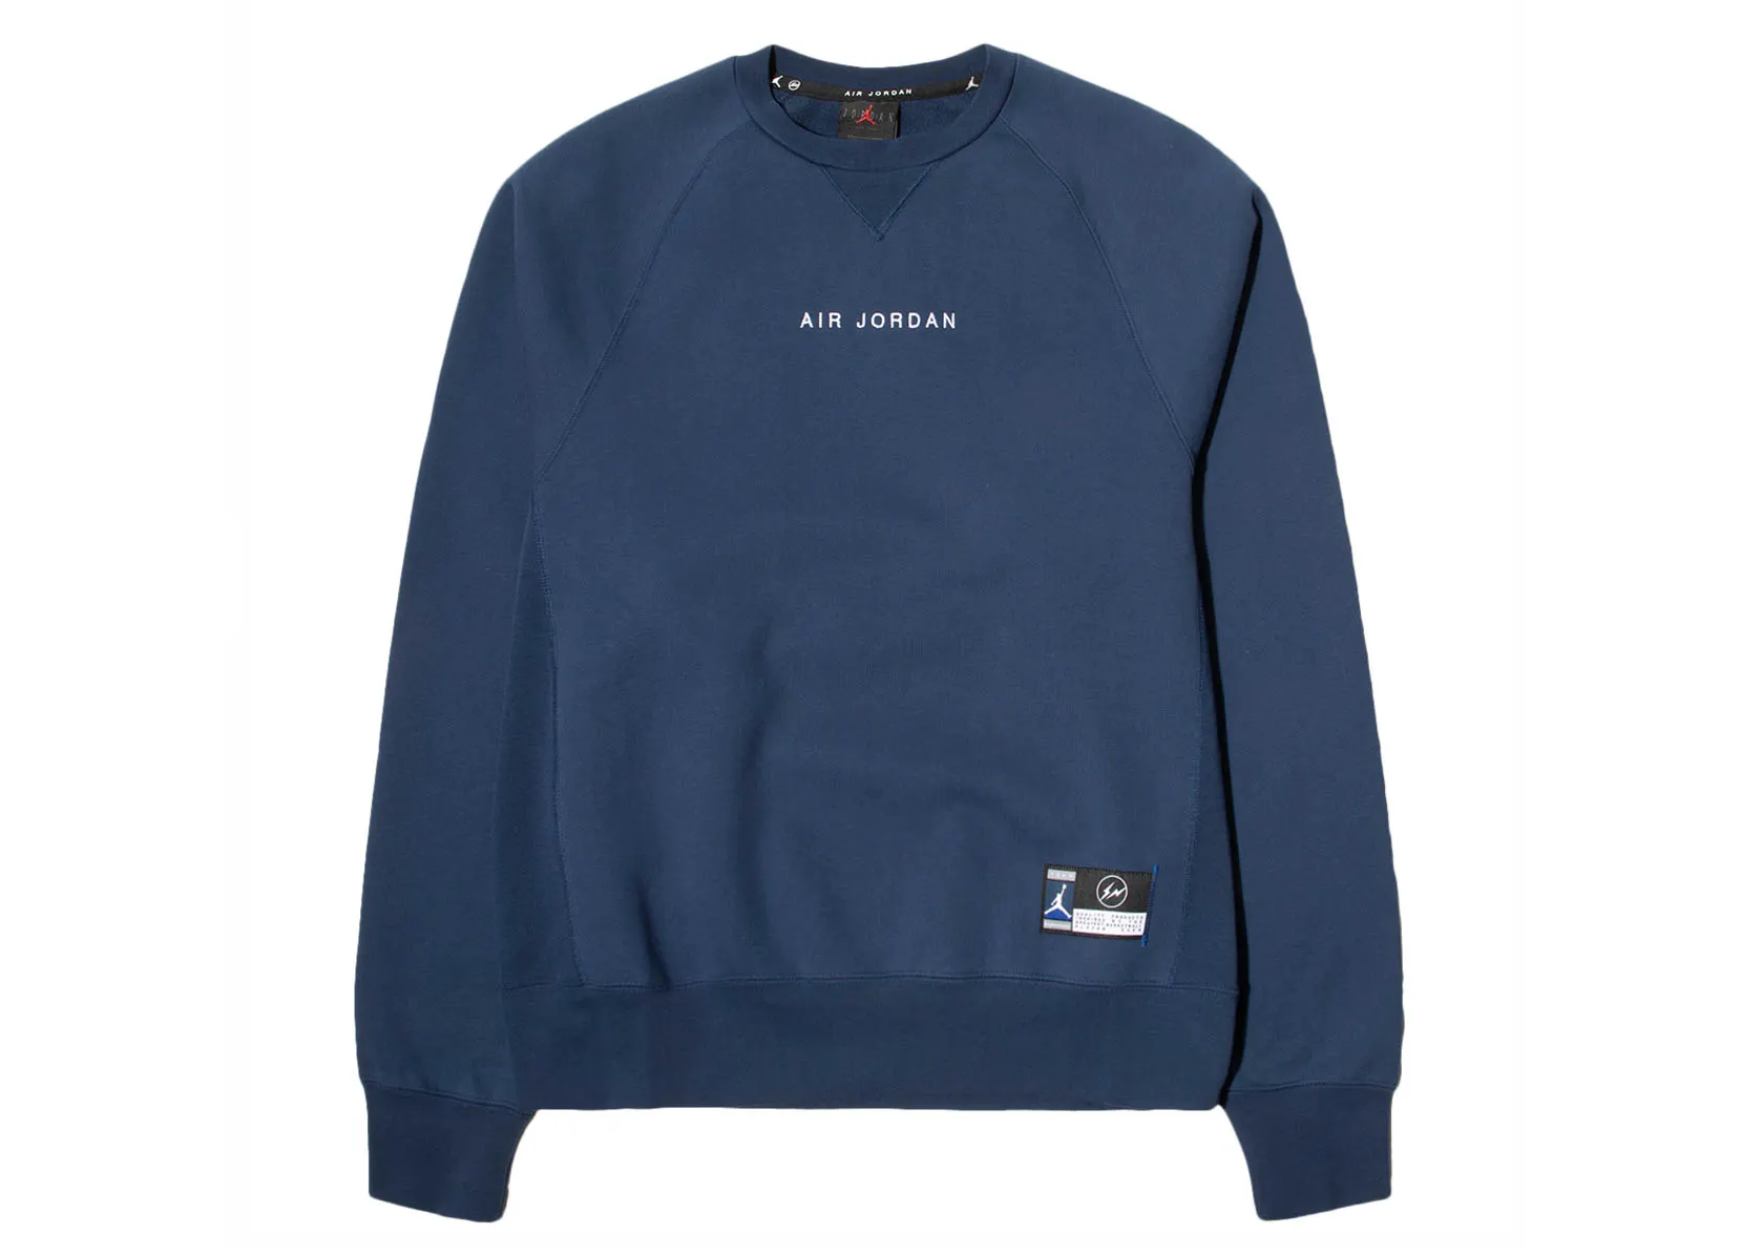 Jordan X Fragment Crewneck Sweatshirt Navy Sport Royal White Crew Neck Sweatshirt Sweatshirts Jordans [ 1248 x 1748 Pixel ]